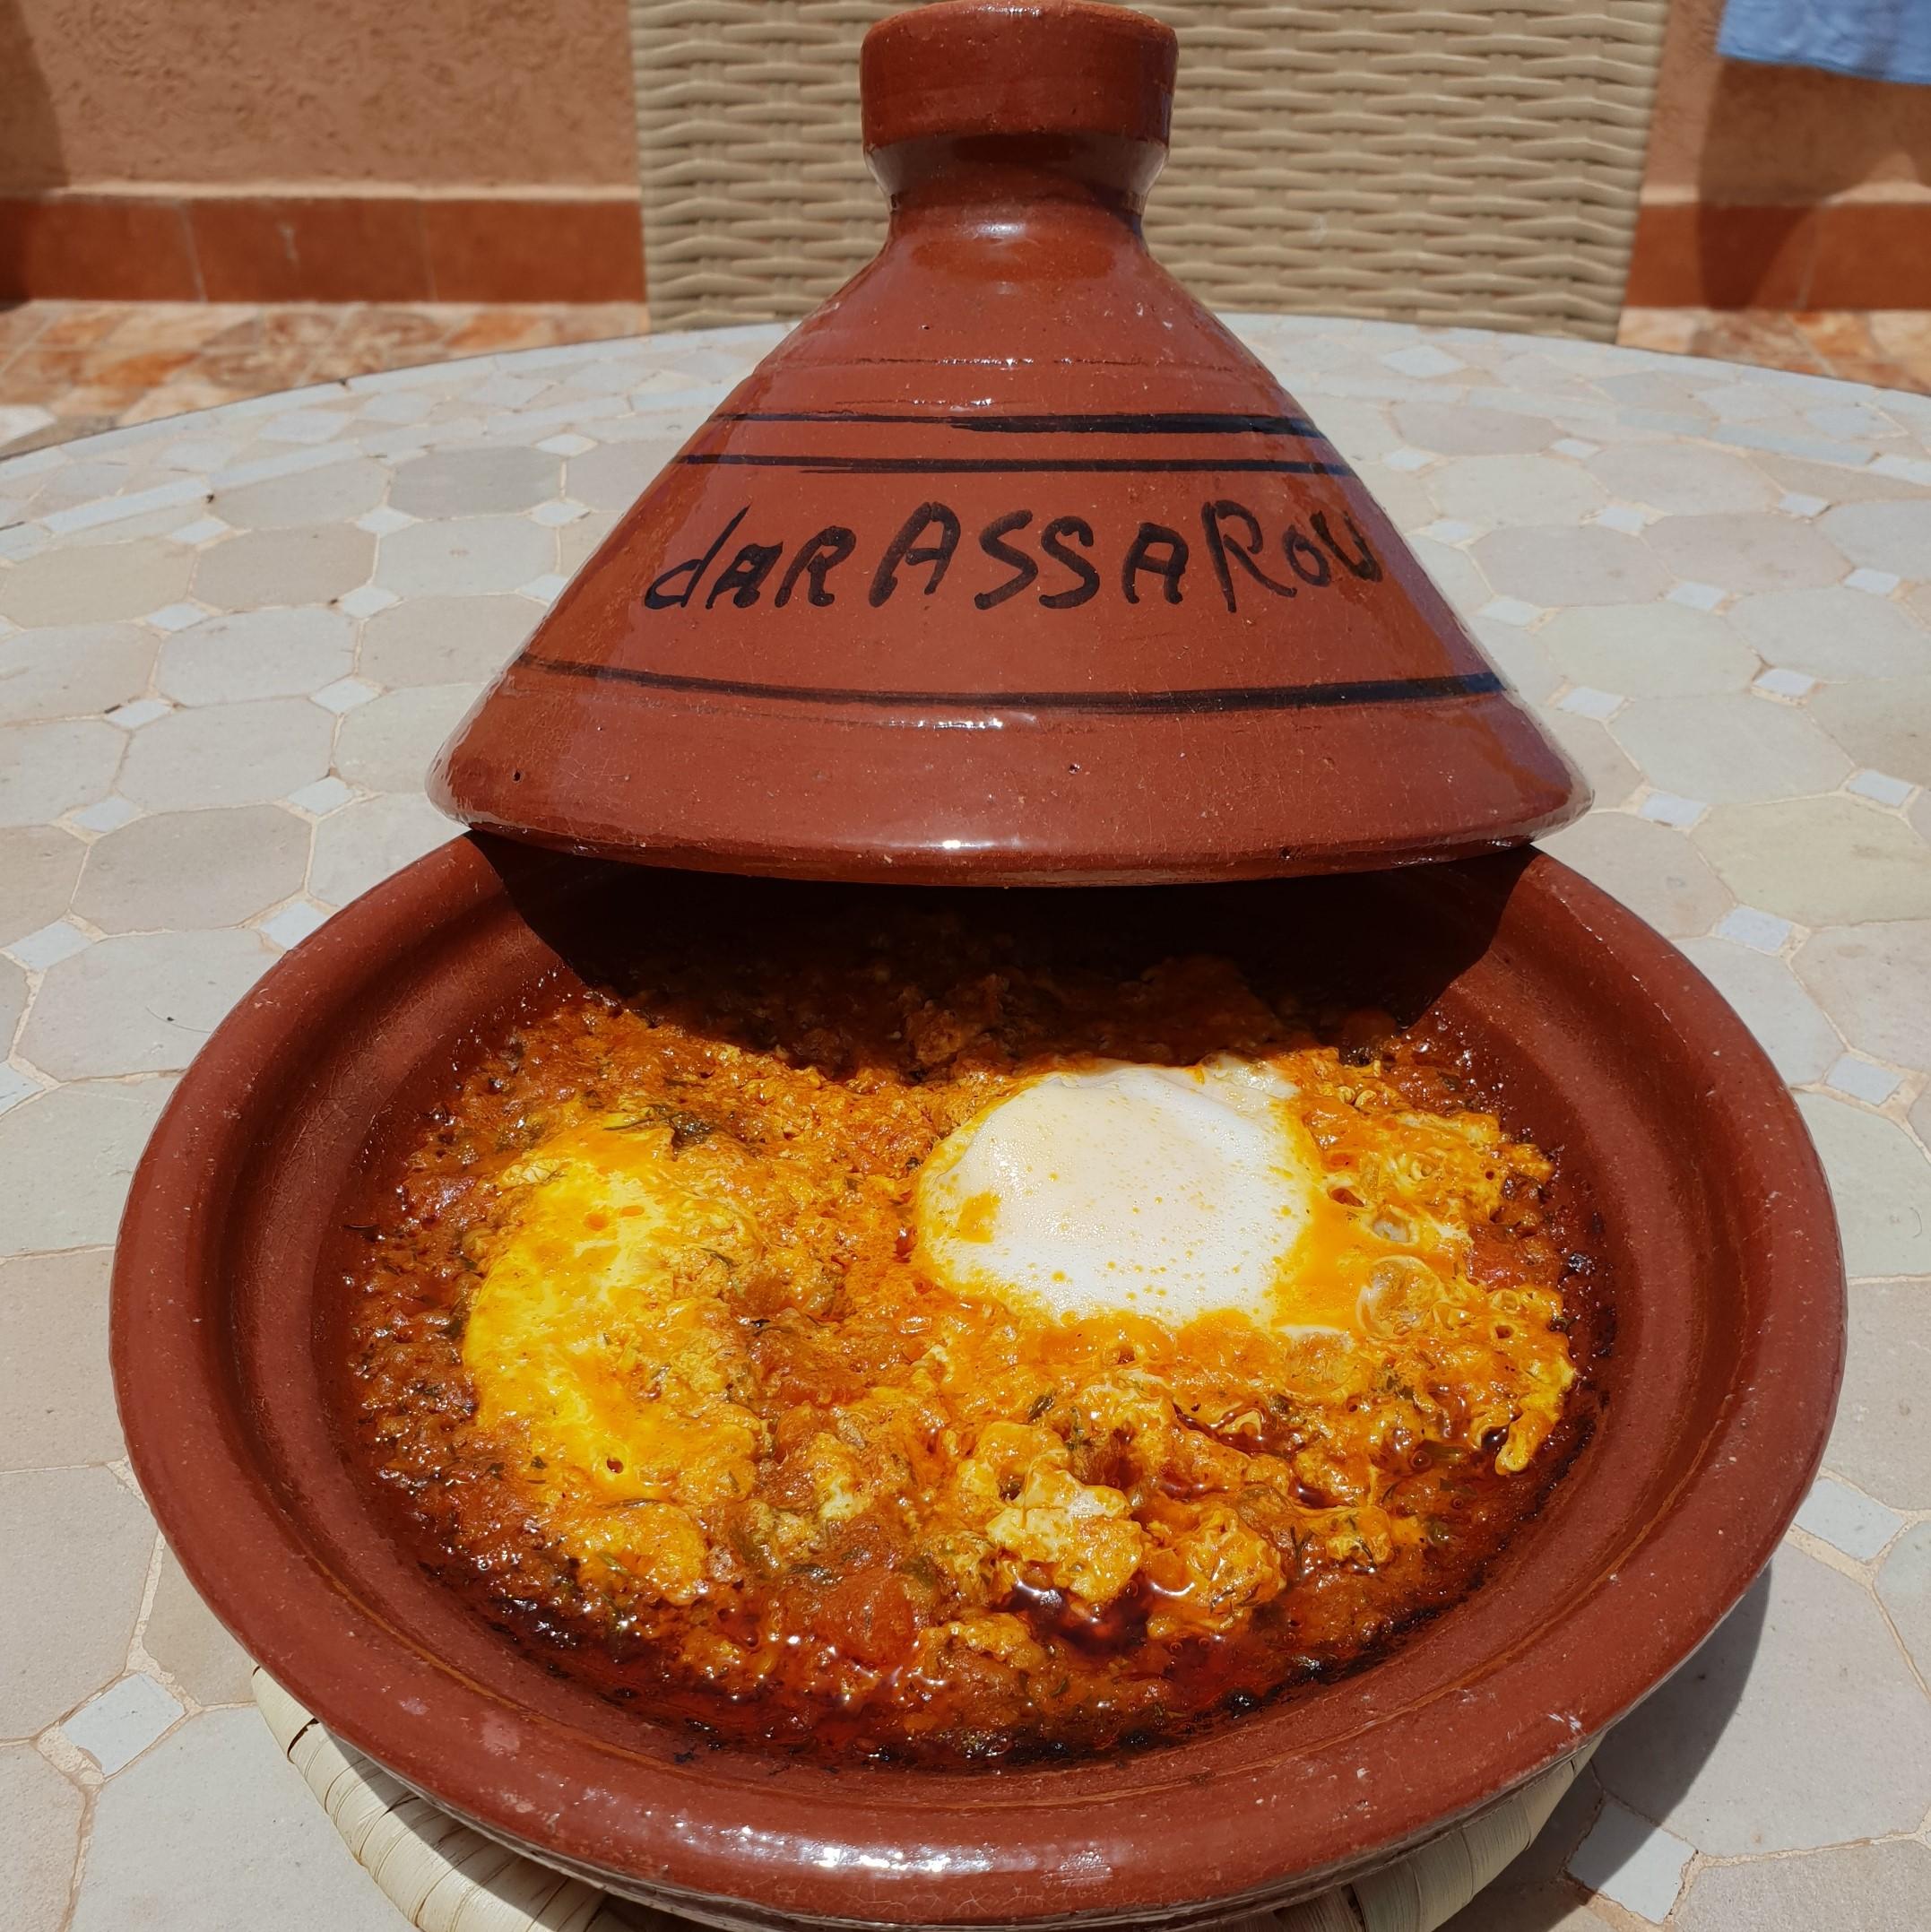 Dar Assarou Food